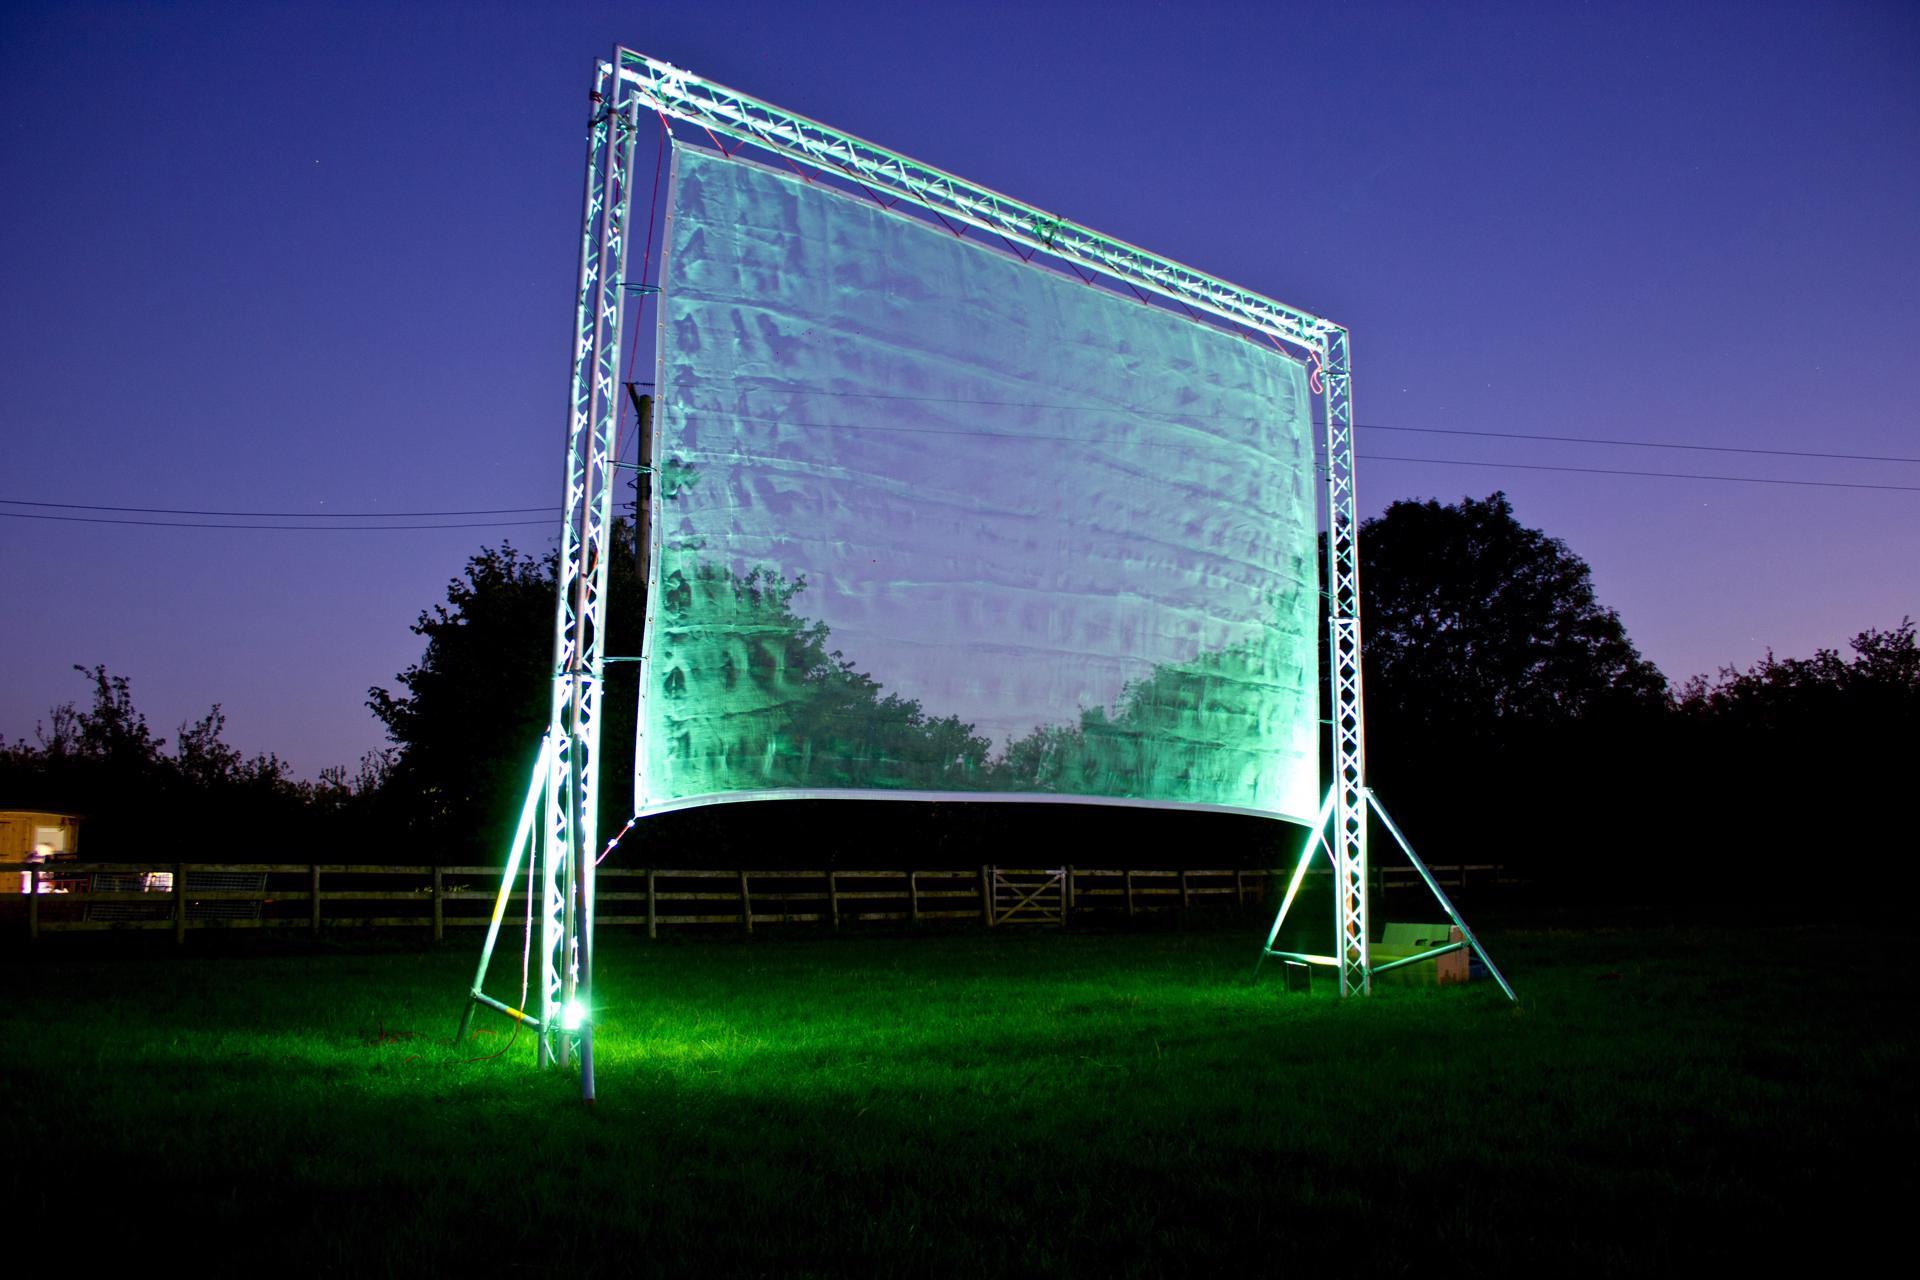 5m-high-laser-screen_24356296831_o-1920x1280.jpg